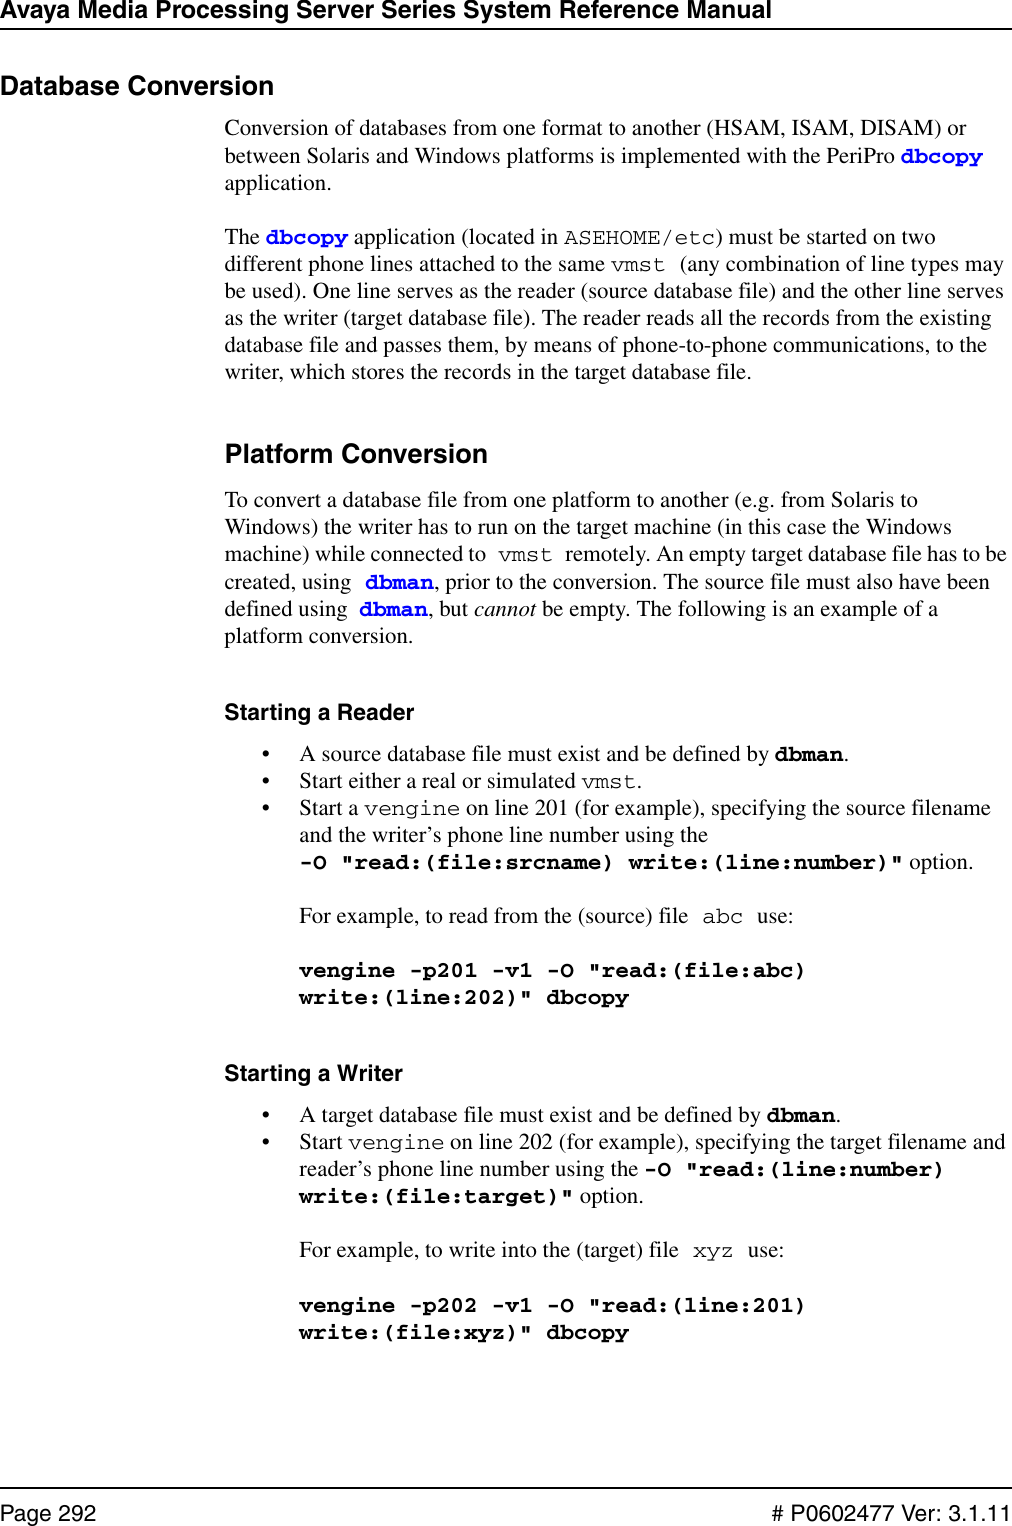 Avaya Media Processing Server Series System Software Release 2 1